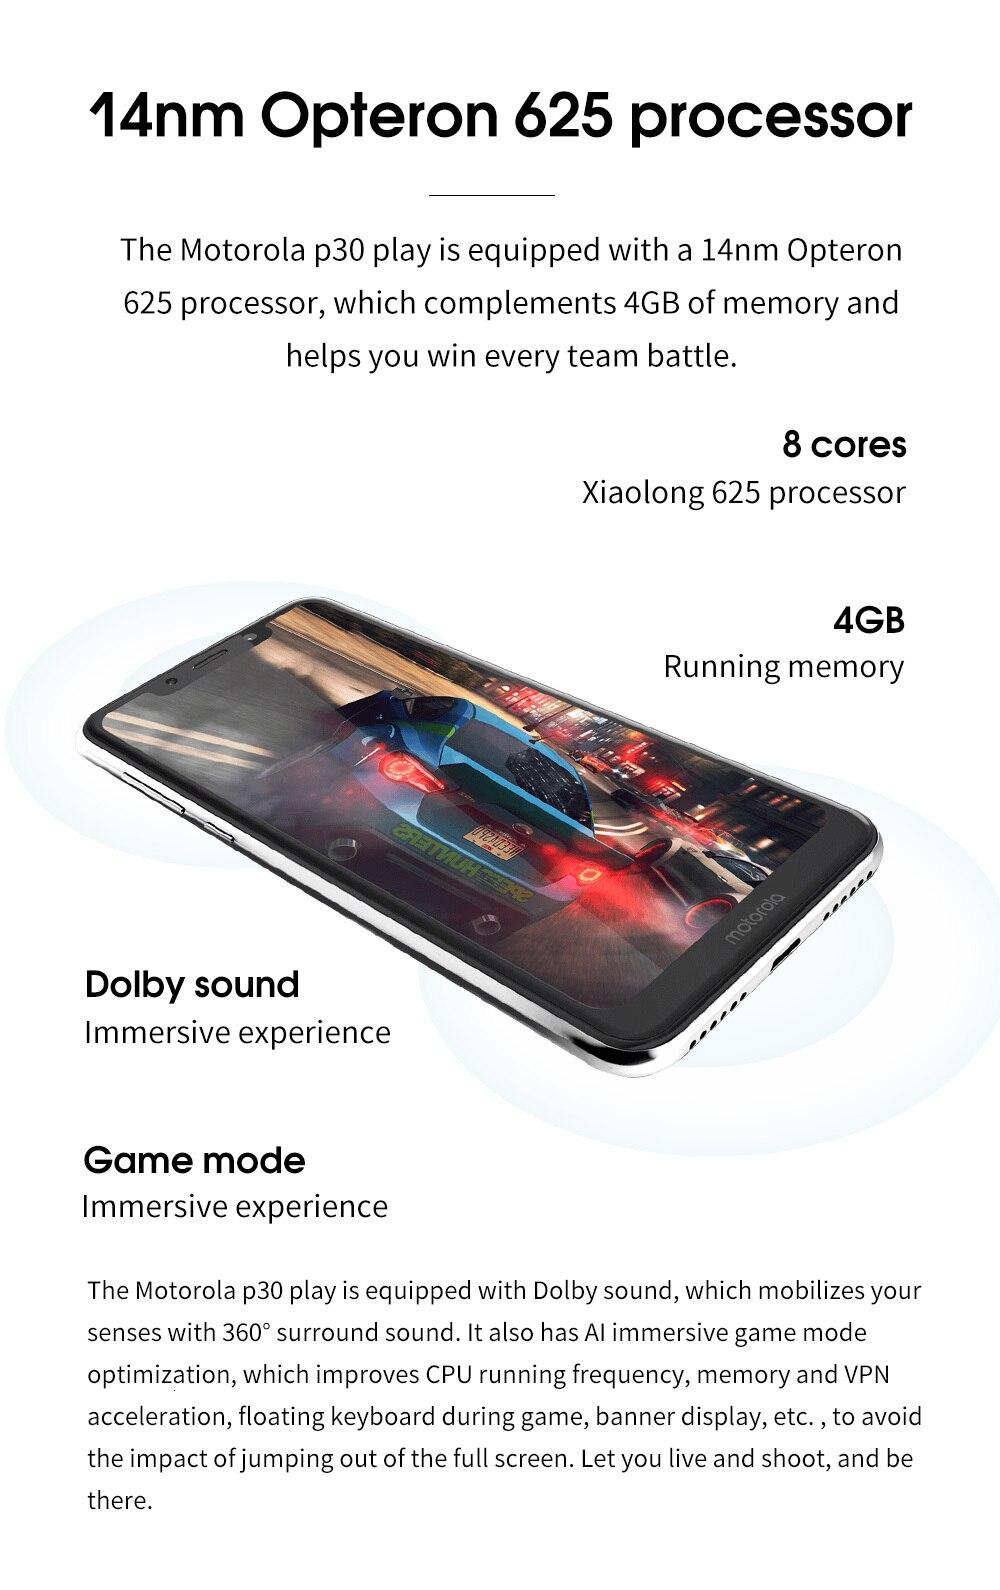 Hf7e61302ca5644e4a70b7f8609d95d8fs Moto One Mobile Phone 4GB 64GB AI Camera Smartphone 2.5D Double-sided Glass Body Octa Core Phone Support Face Fingerprint Unlock